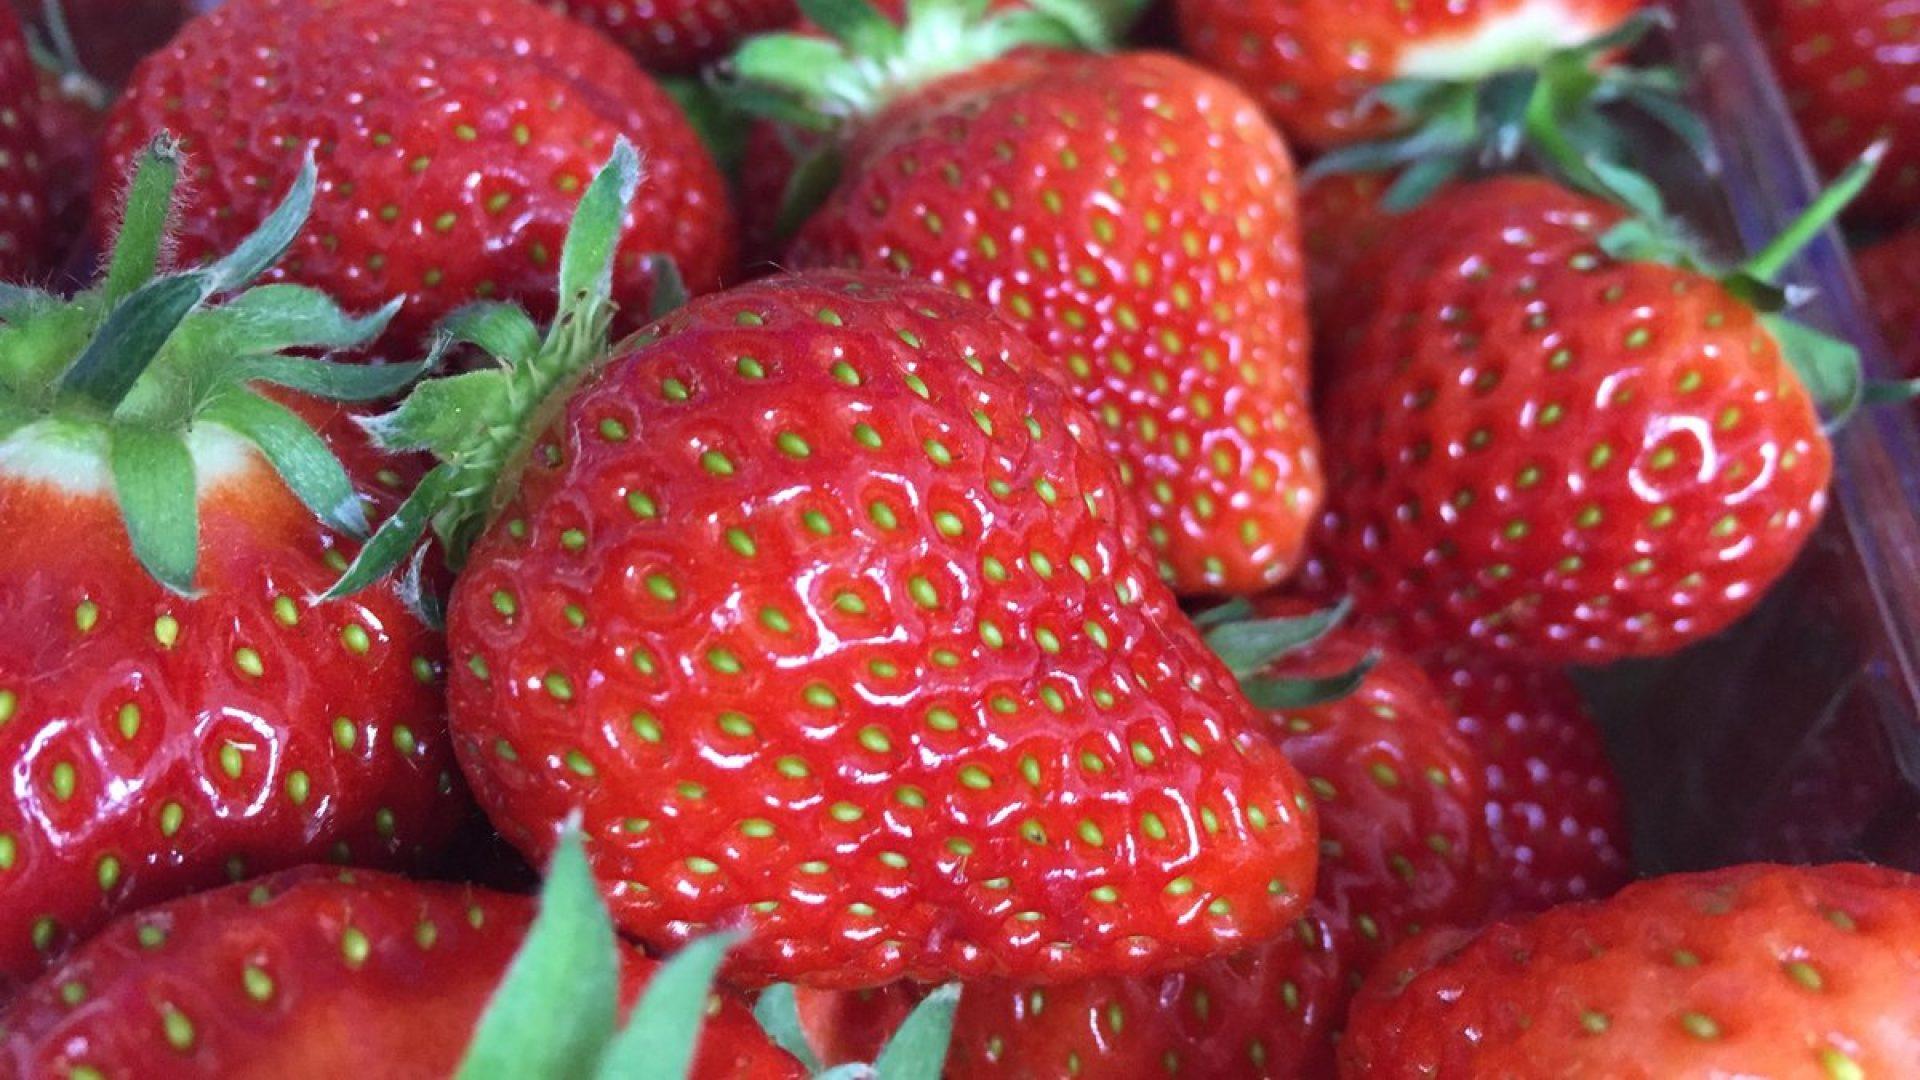 Sharrington strawberries